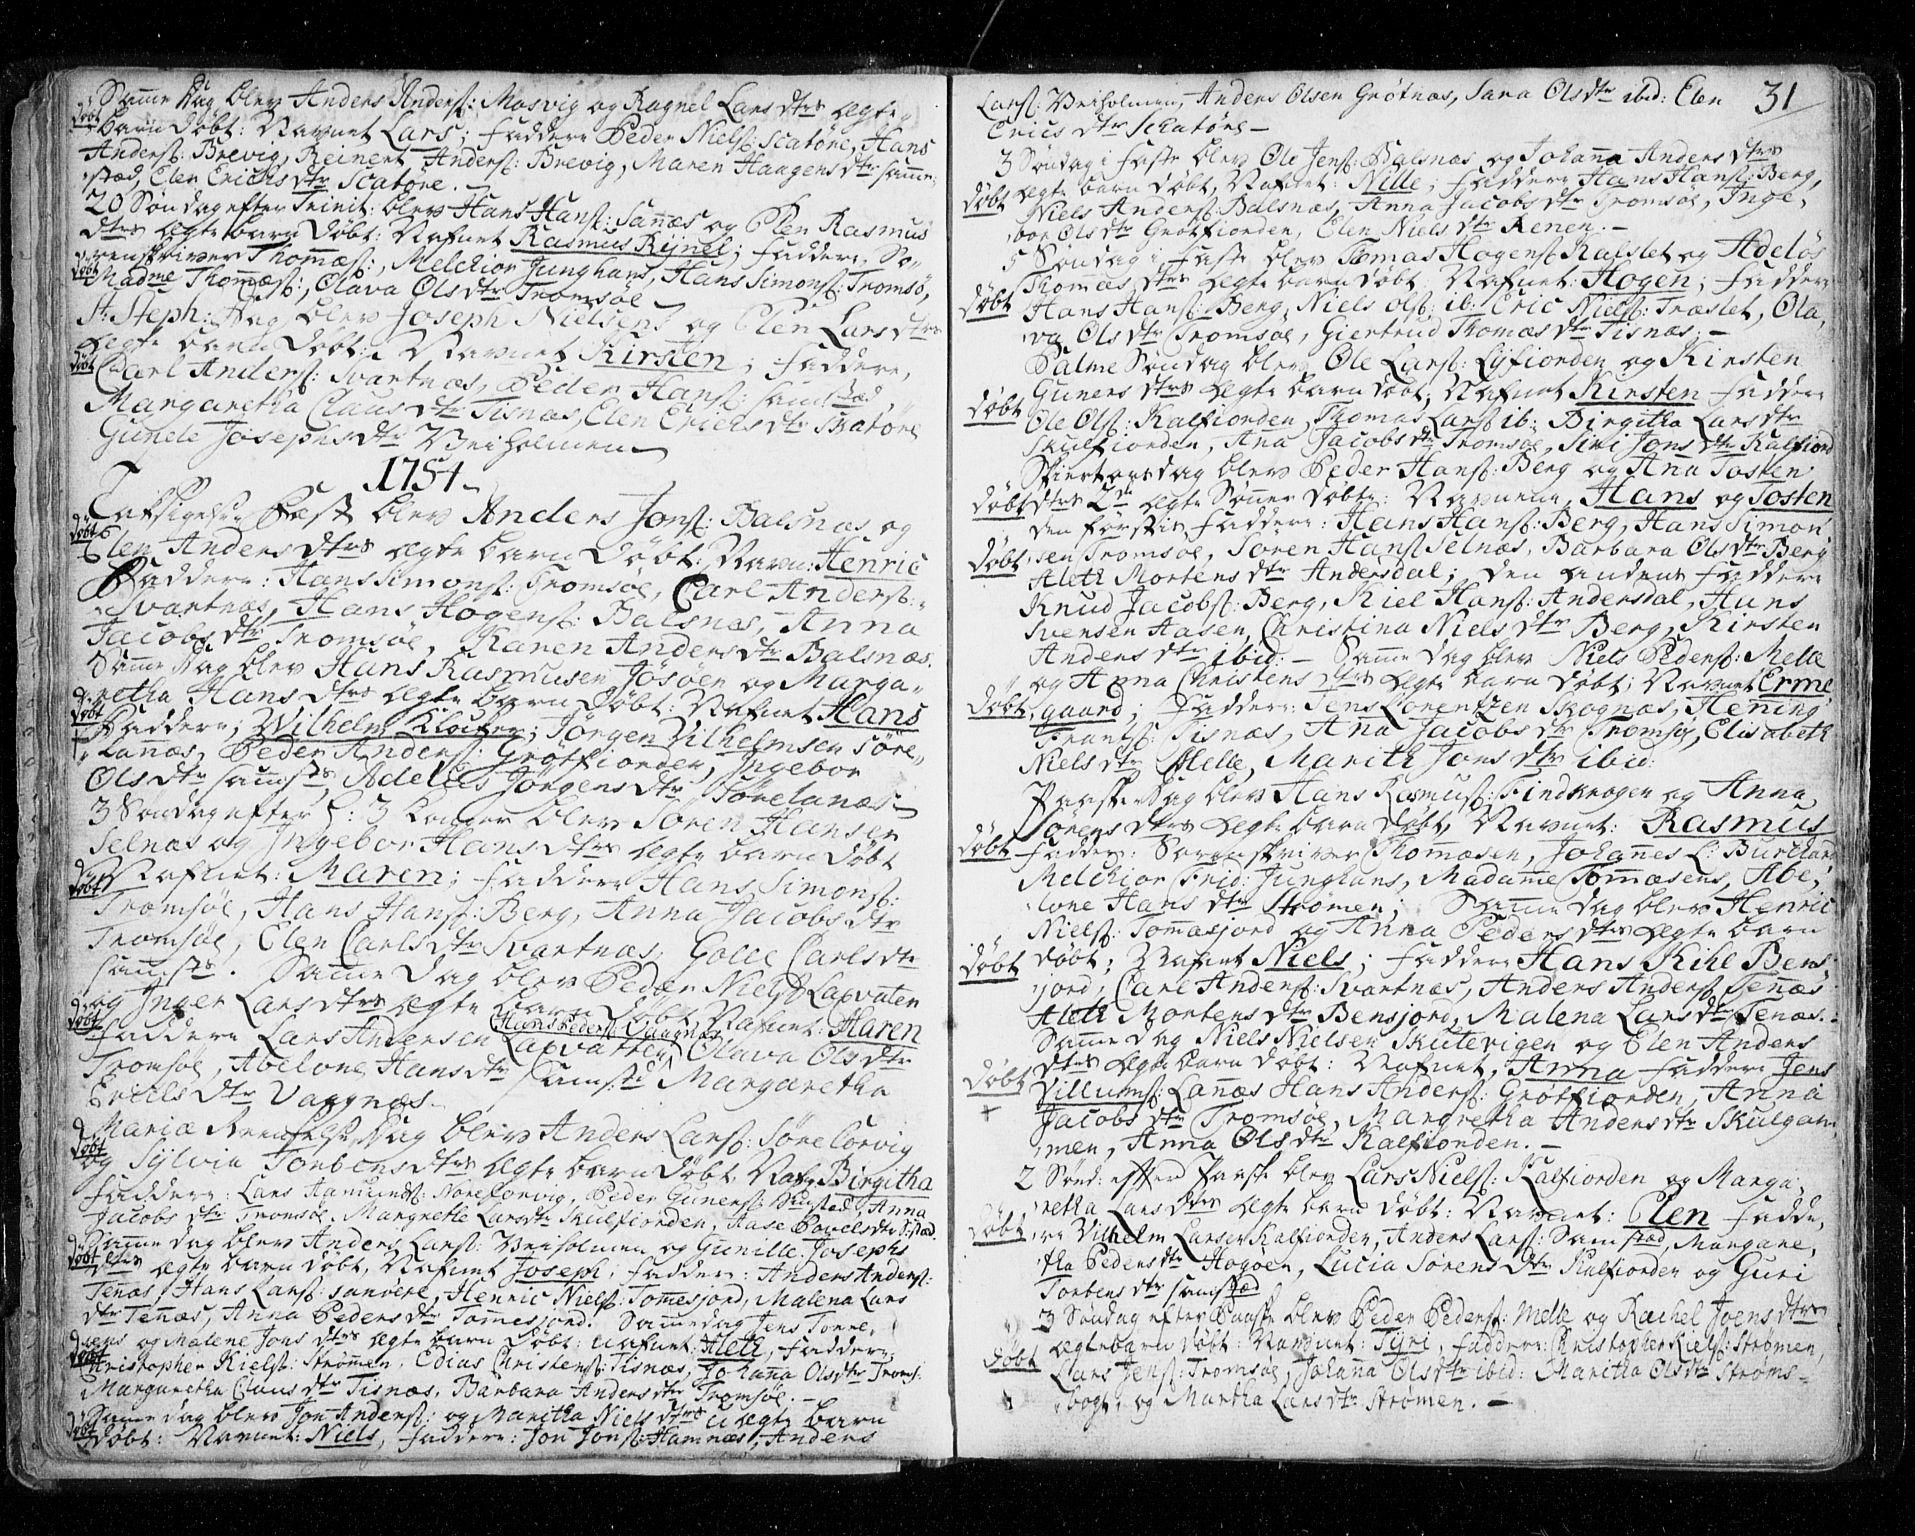 SATØ, Tromsø sokneprestkontor/stiftsprosti/domprosti, G/Ga/L0002kirke: Parish register (official) no. 2, 1753-1778, p. 31